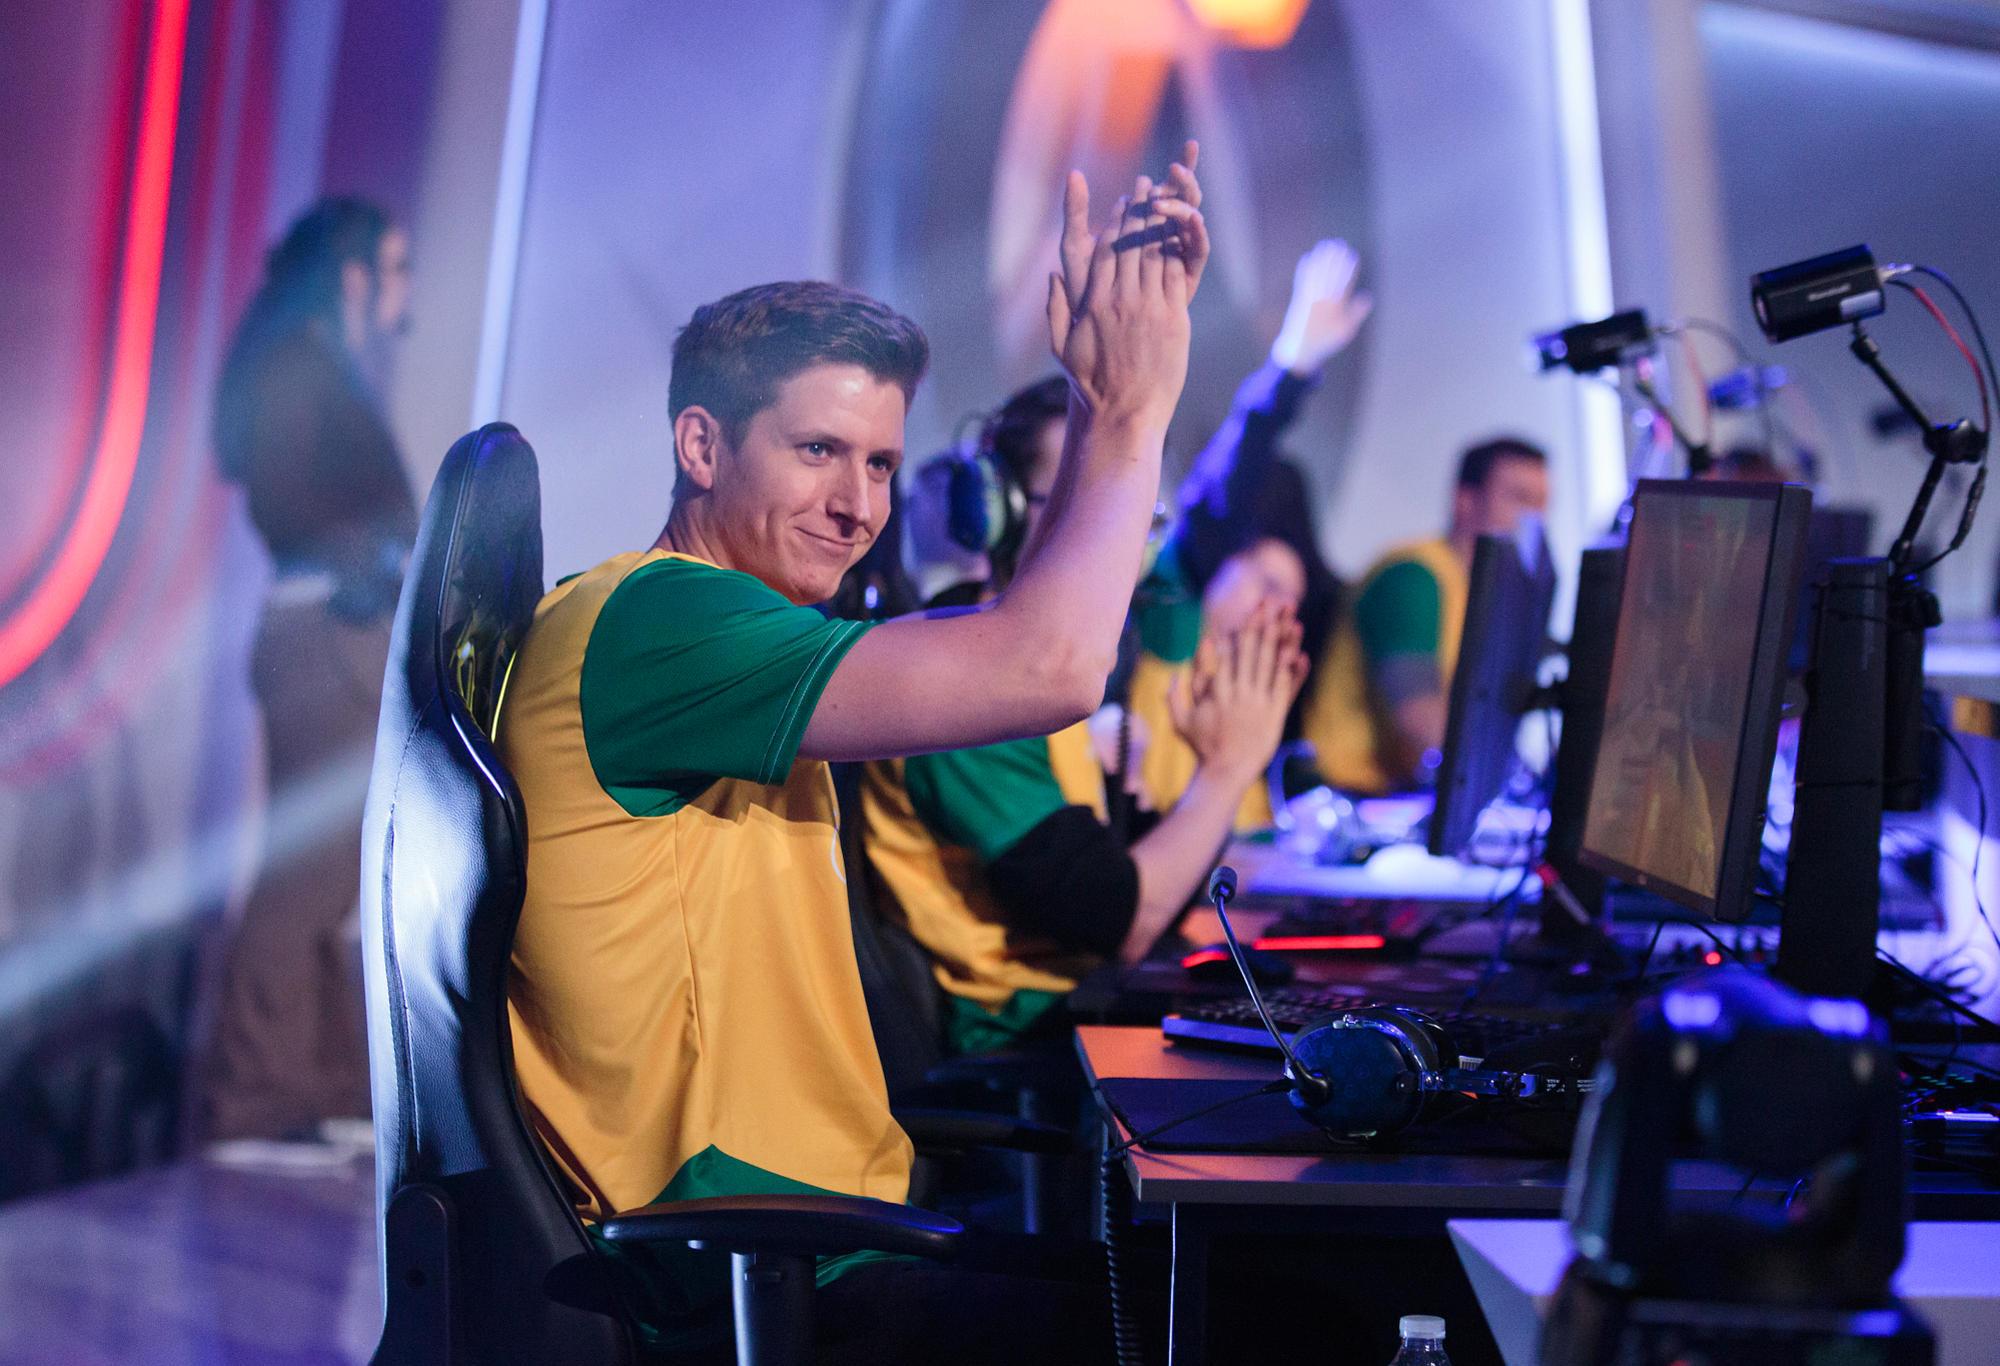 Custa (Scott Kennedy) of Australia's Overwatch World Cup team applauds the supporters following a win.